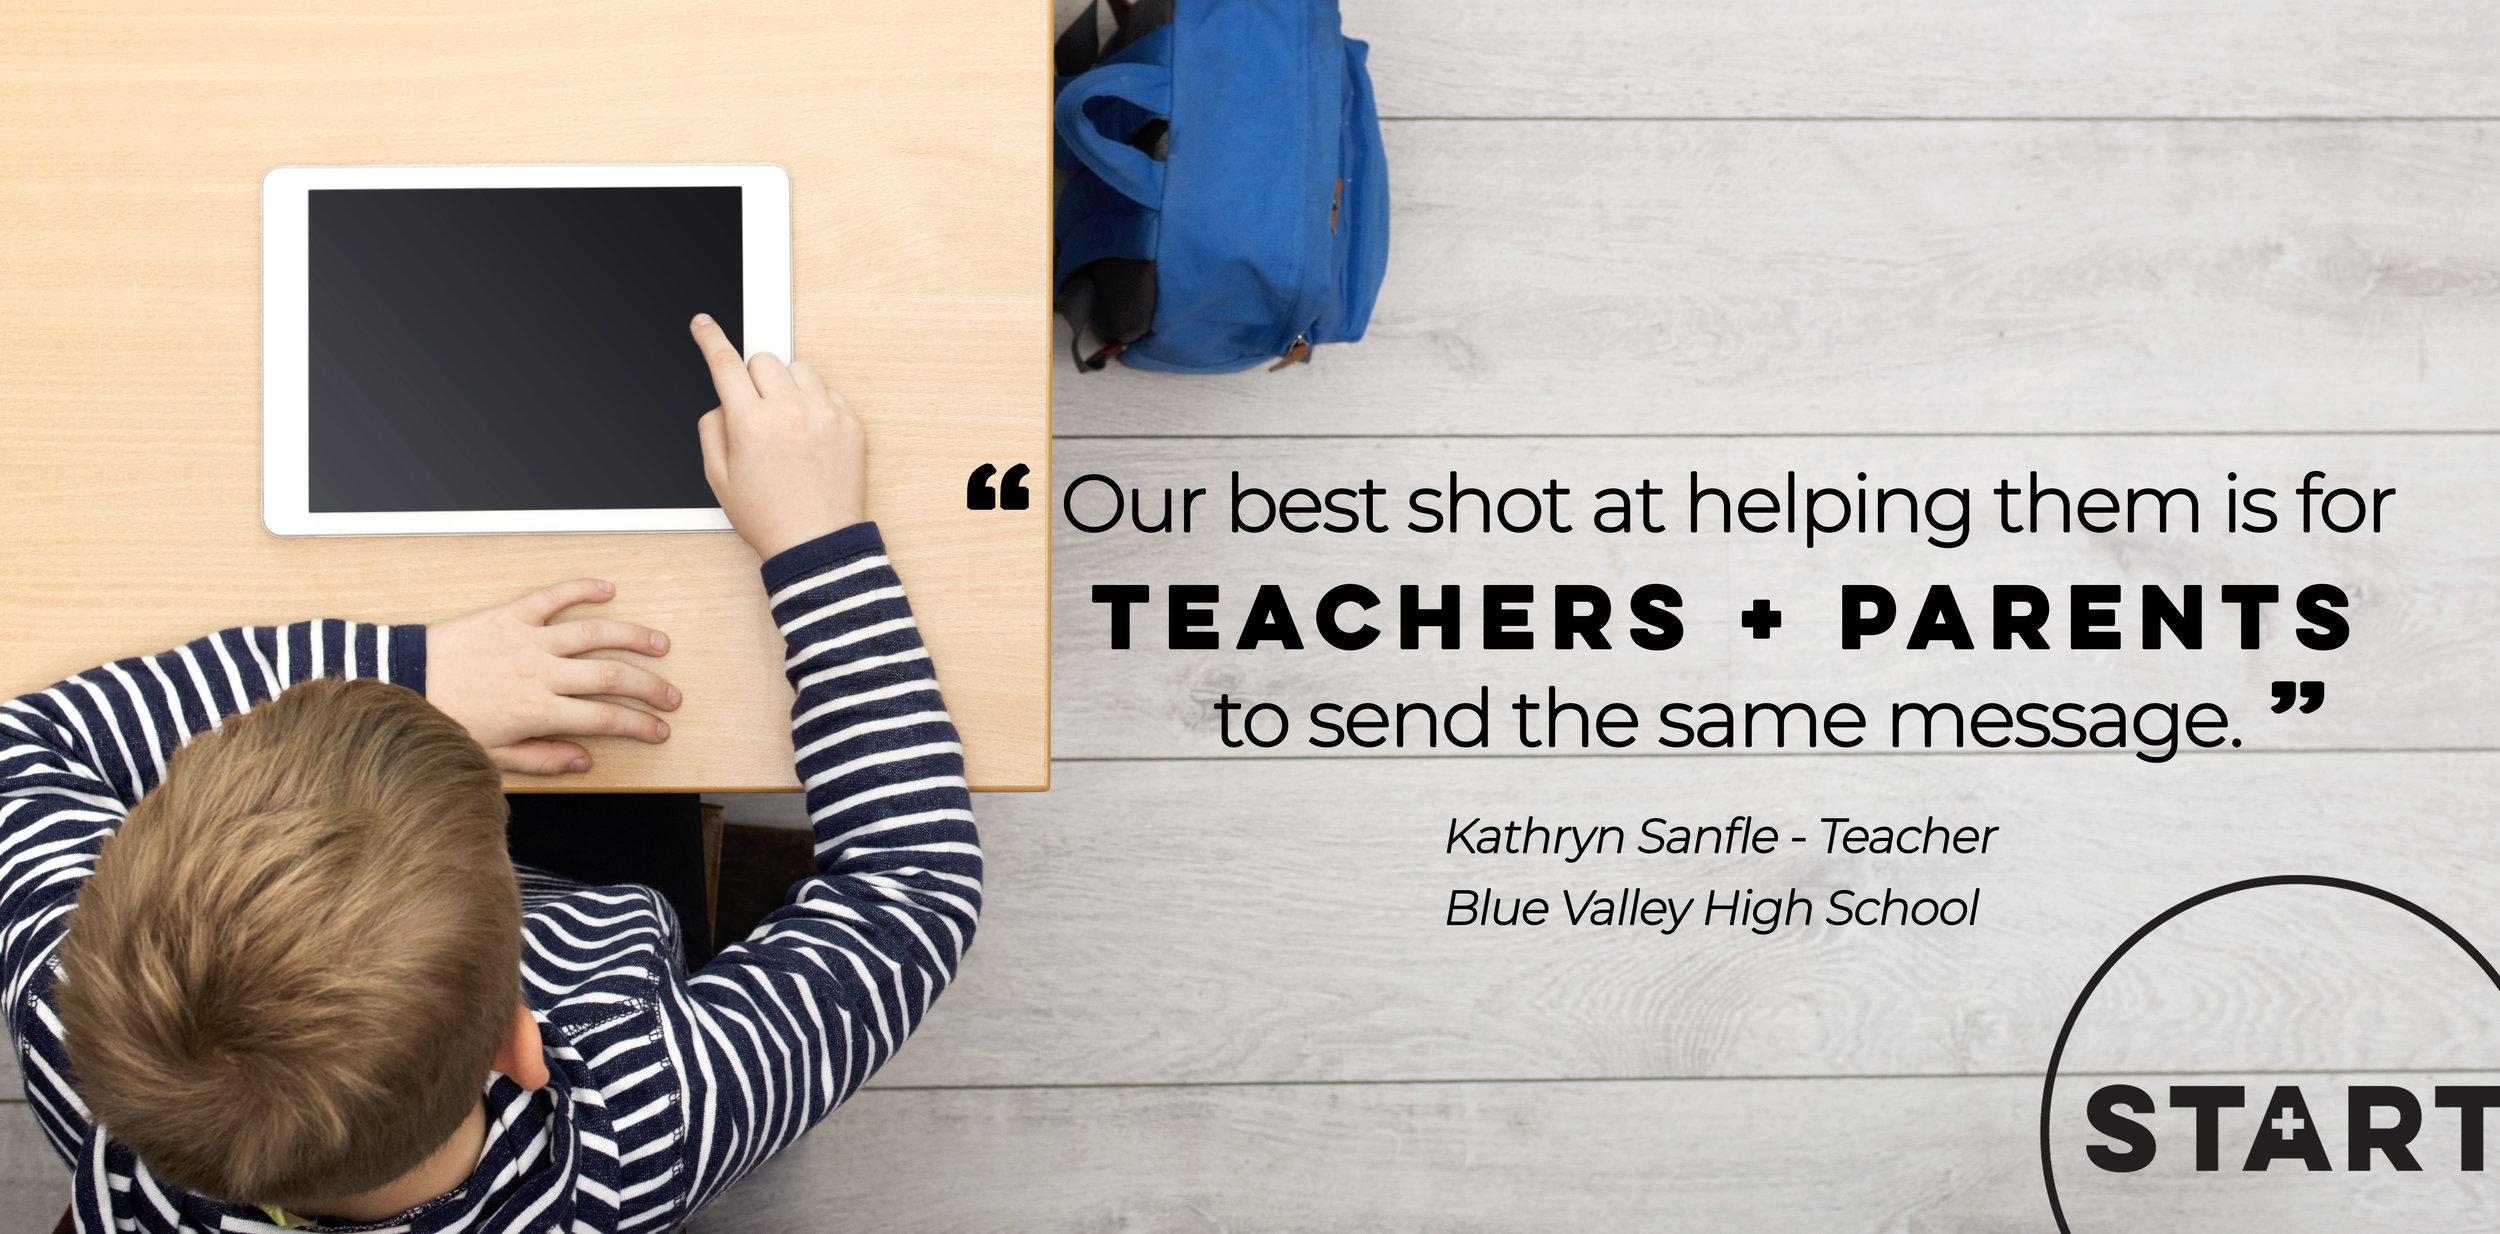 teachersandparents5.jpg